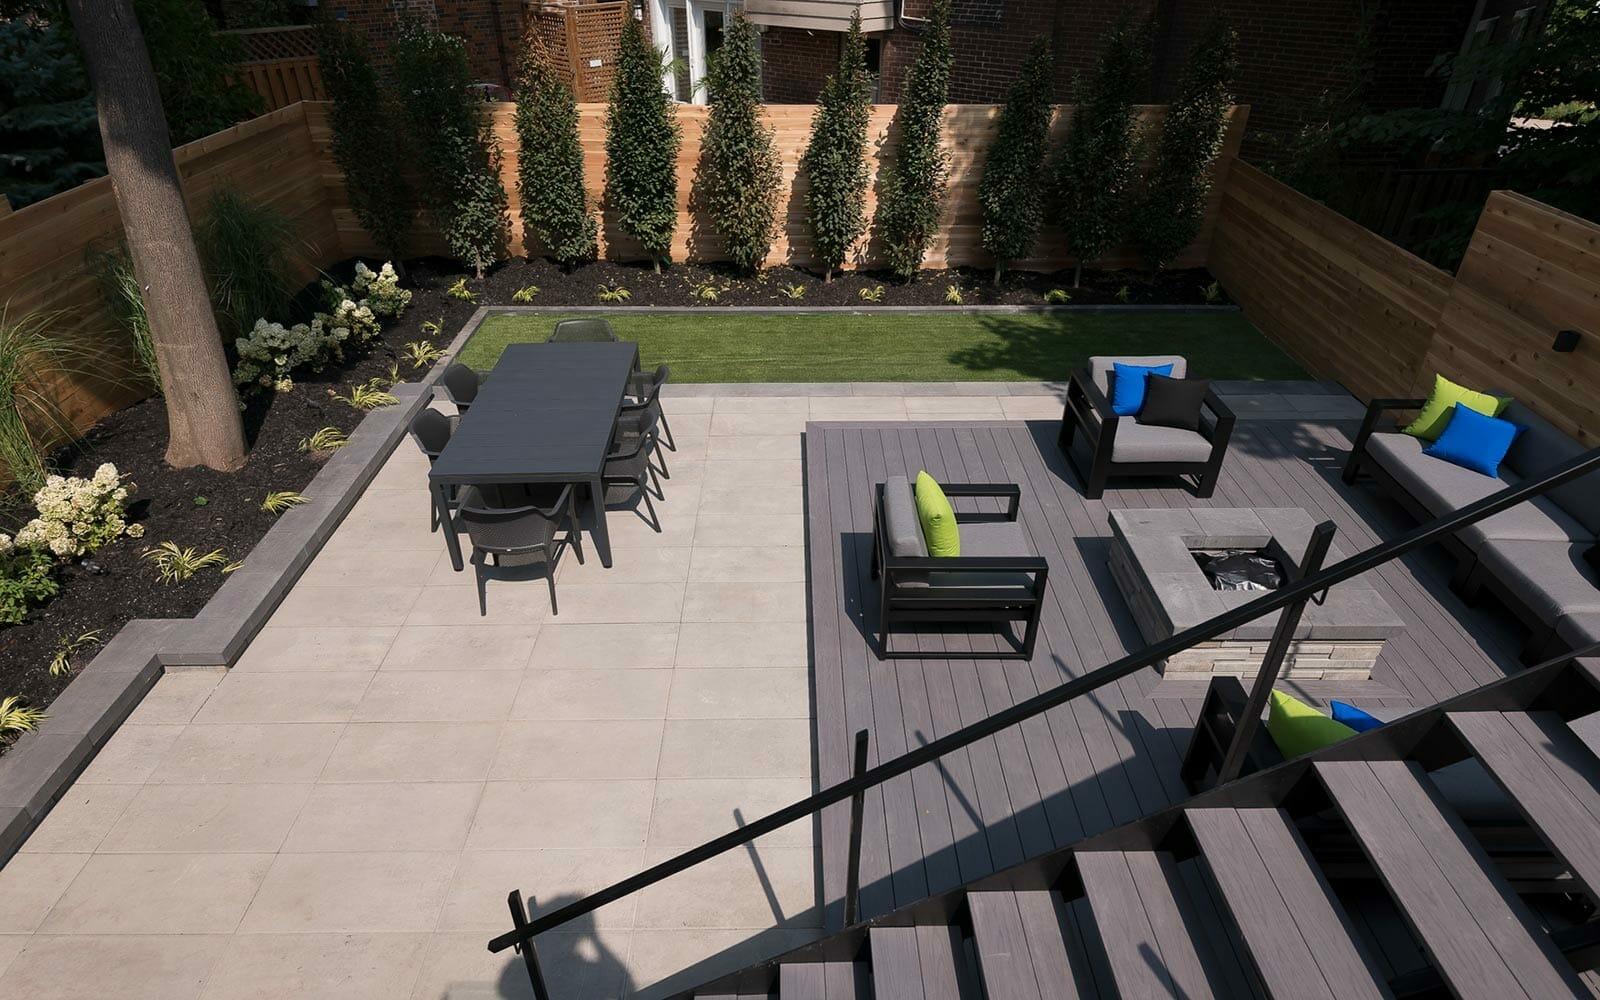 Toronto Landscaping & Decking Company - Patio Design; Featuring Custom Deck & Fence Building, Aluminum Railings, Retaining Walls, Landscaping Design & Interlocking.